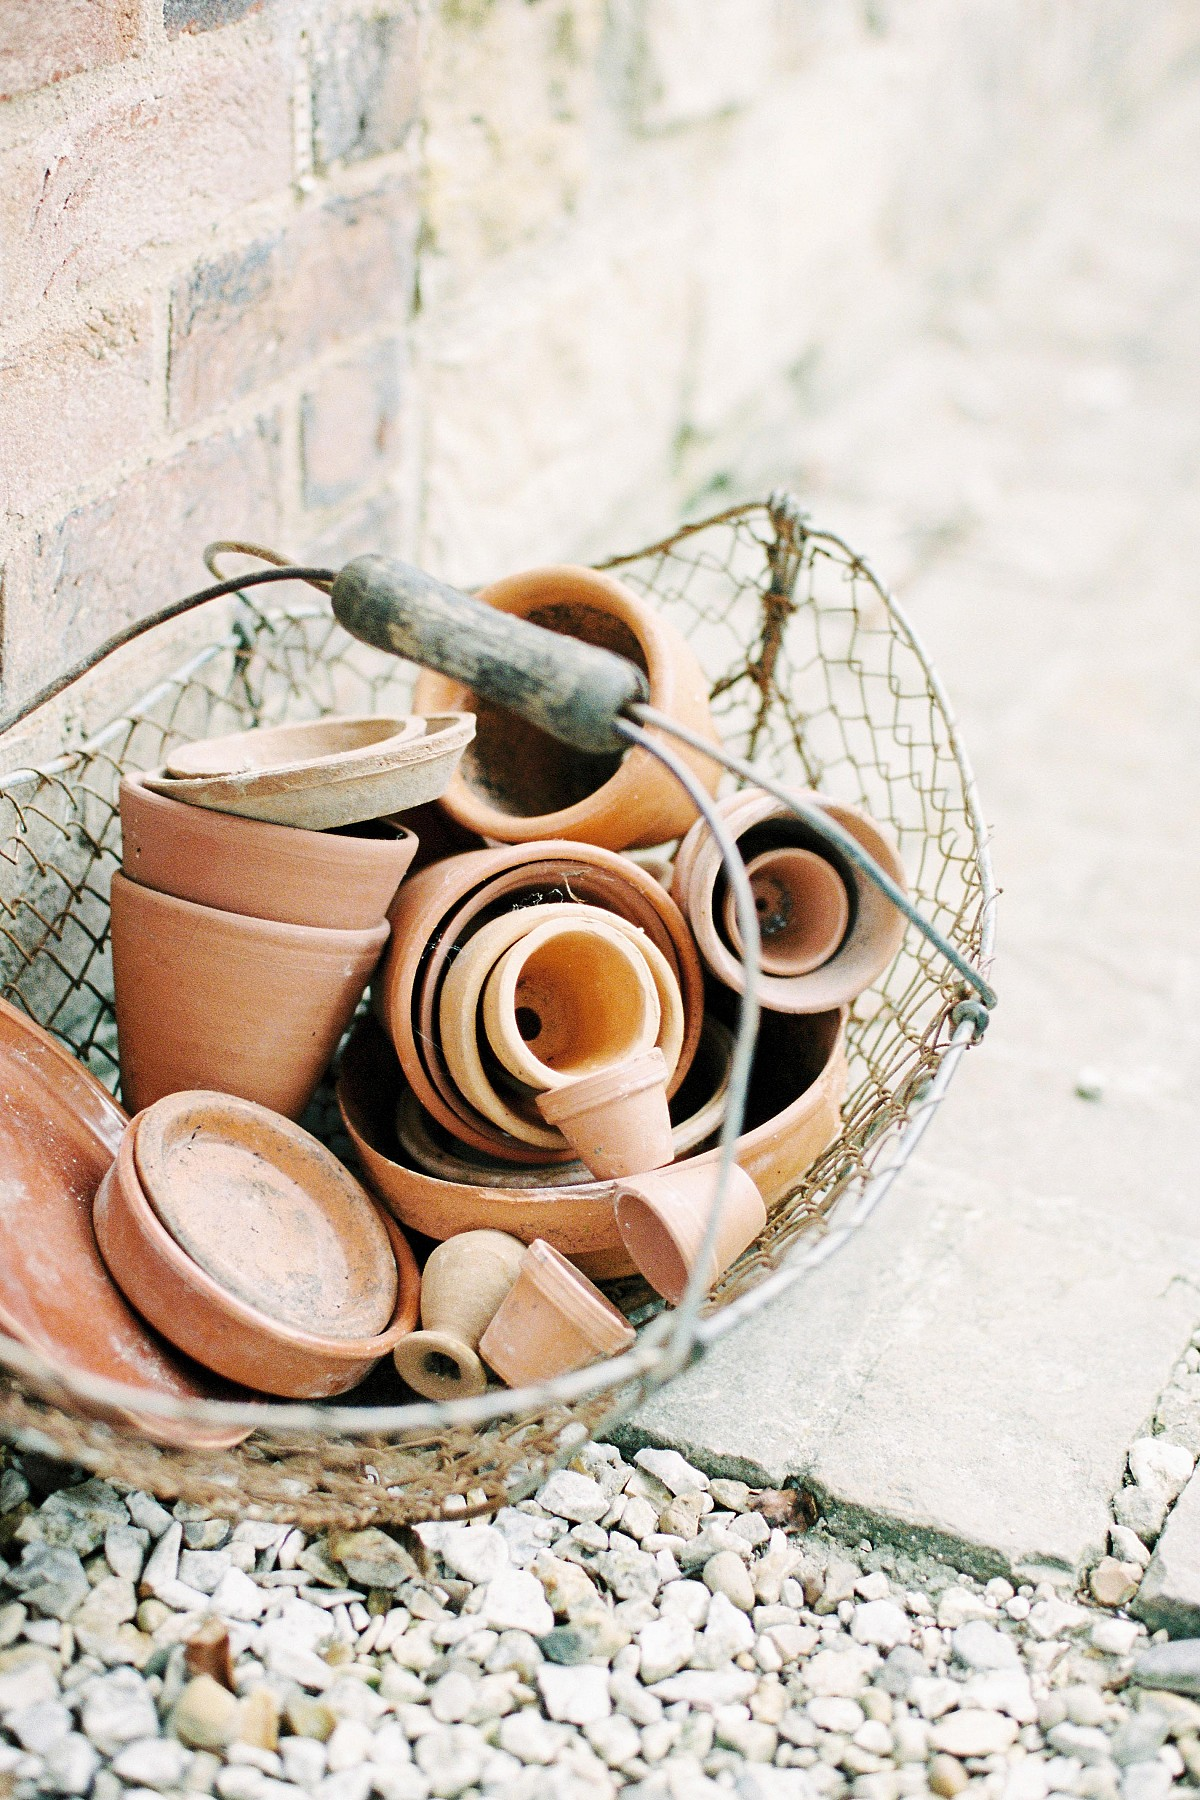 Tuscan Inspired Ethereal Wedding Ideas by Melissa Beattie Photography   Wedding Sparrow   wedding blog